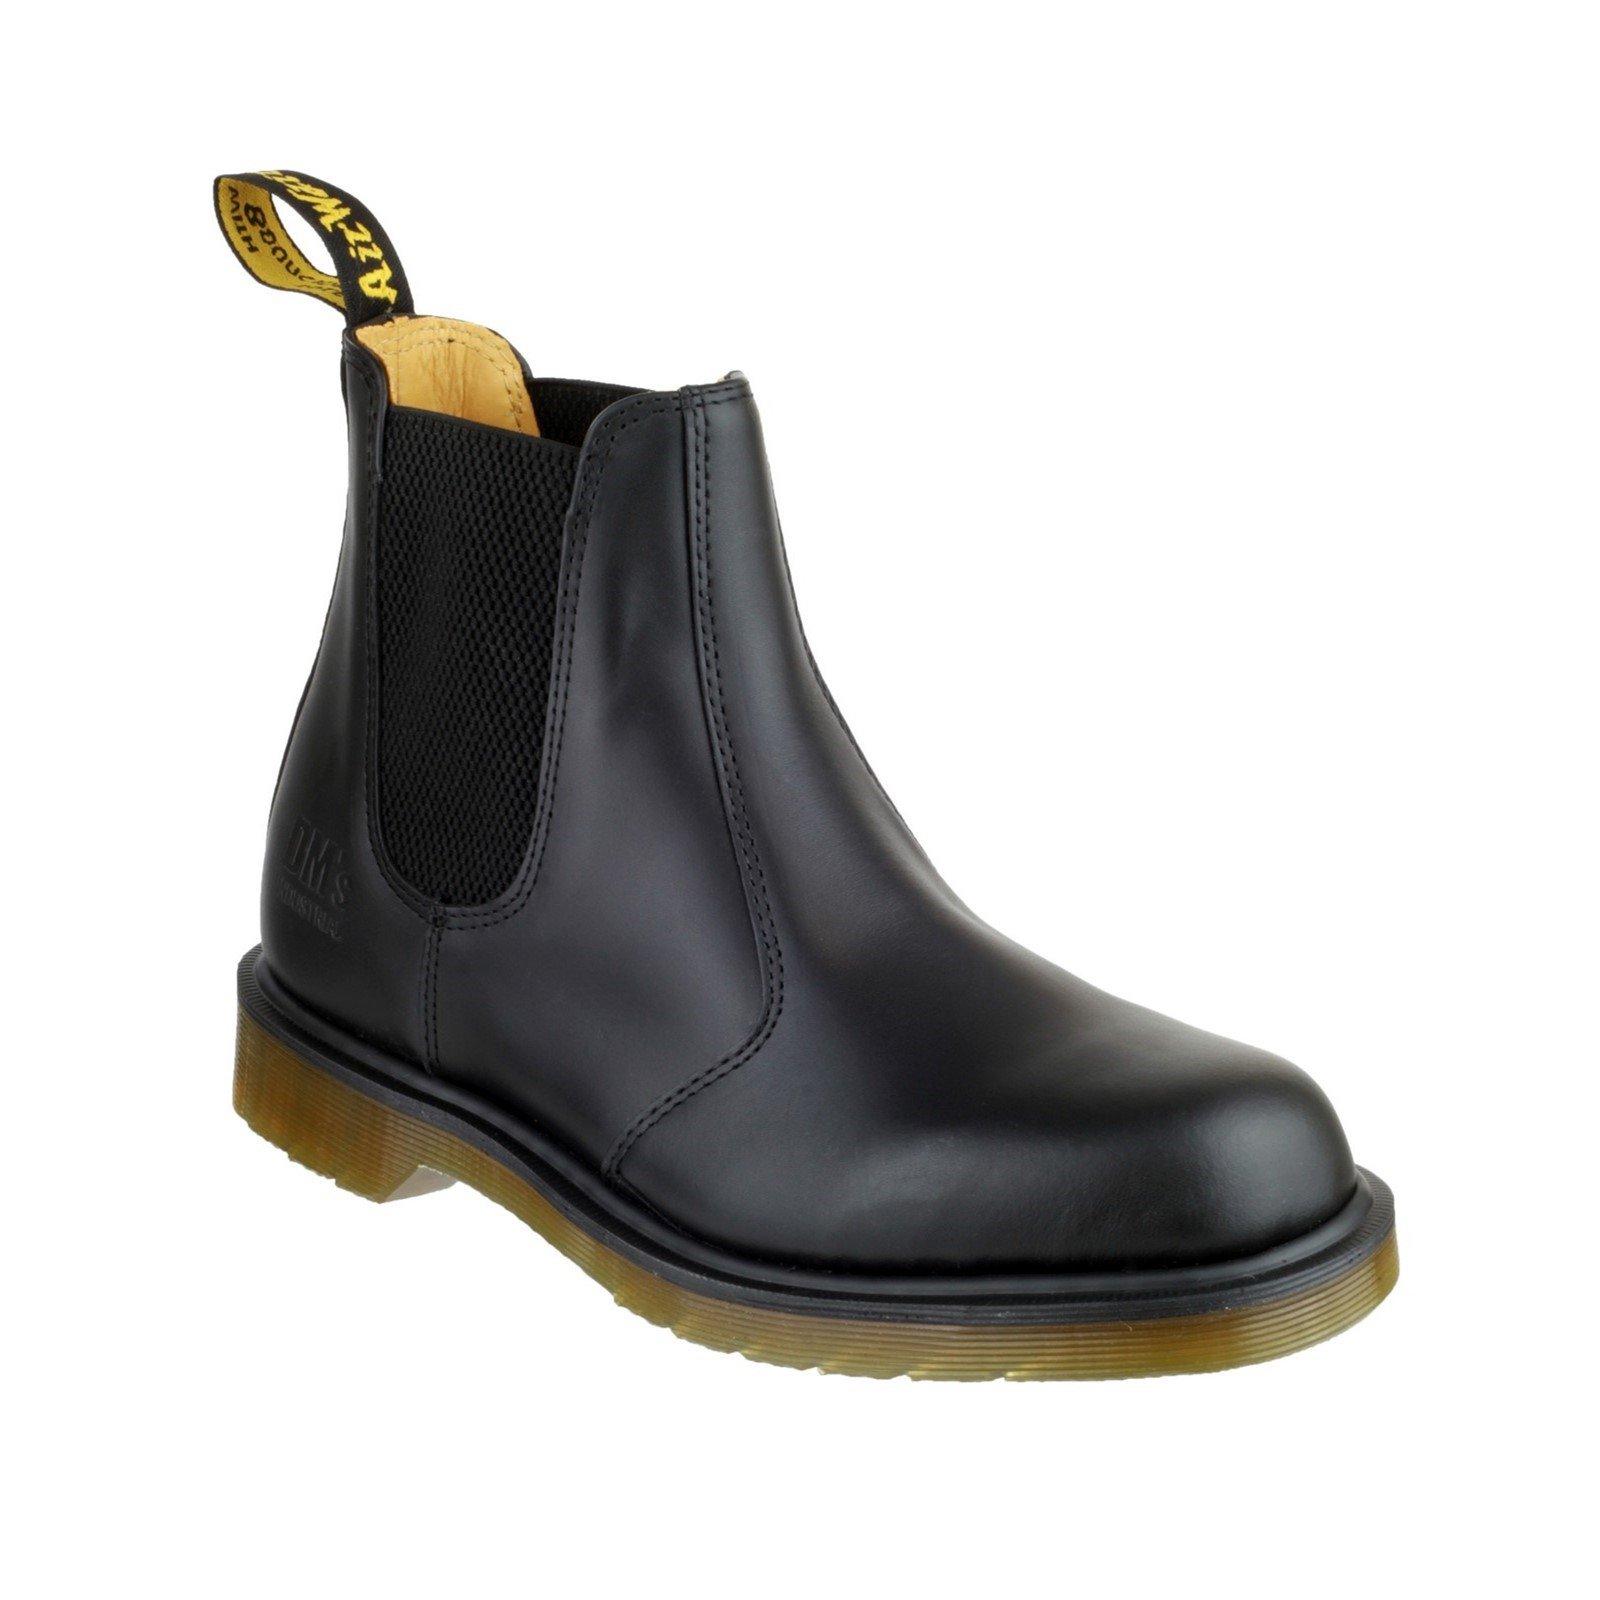 Dr Martens Men's Slip-On Dealer Boot Black 04916 - Black 15